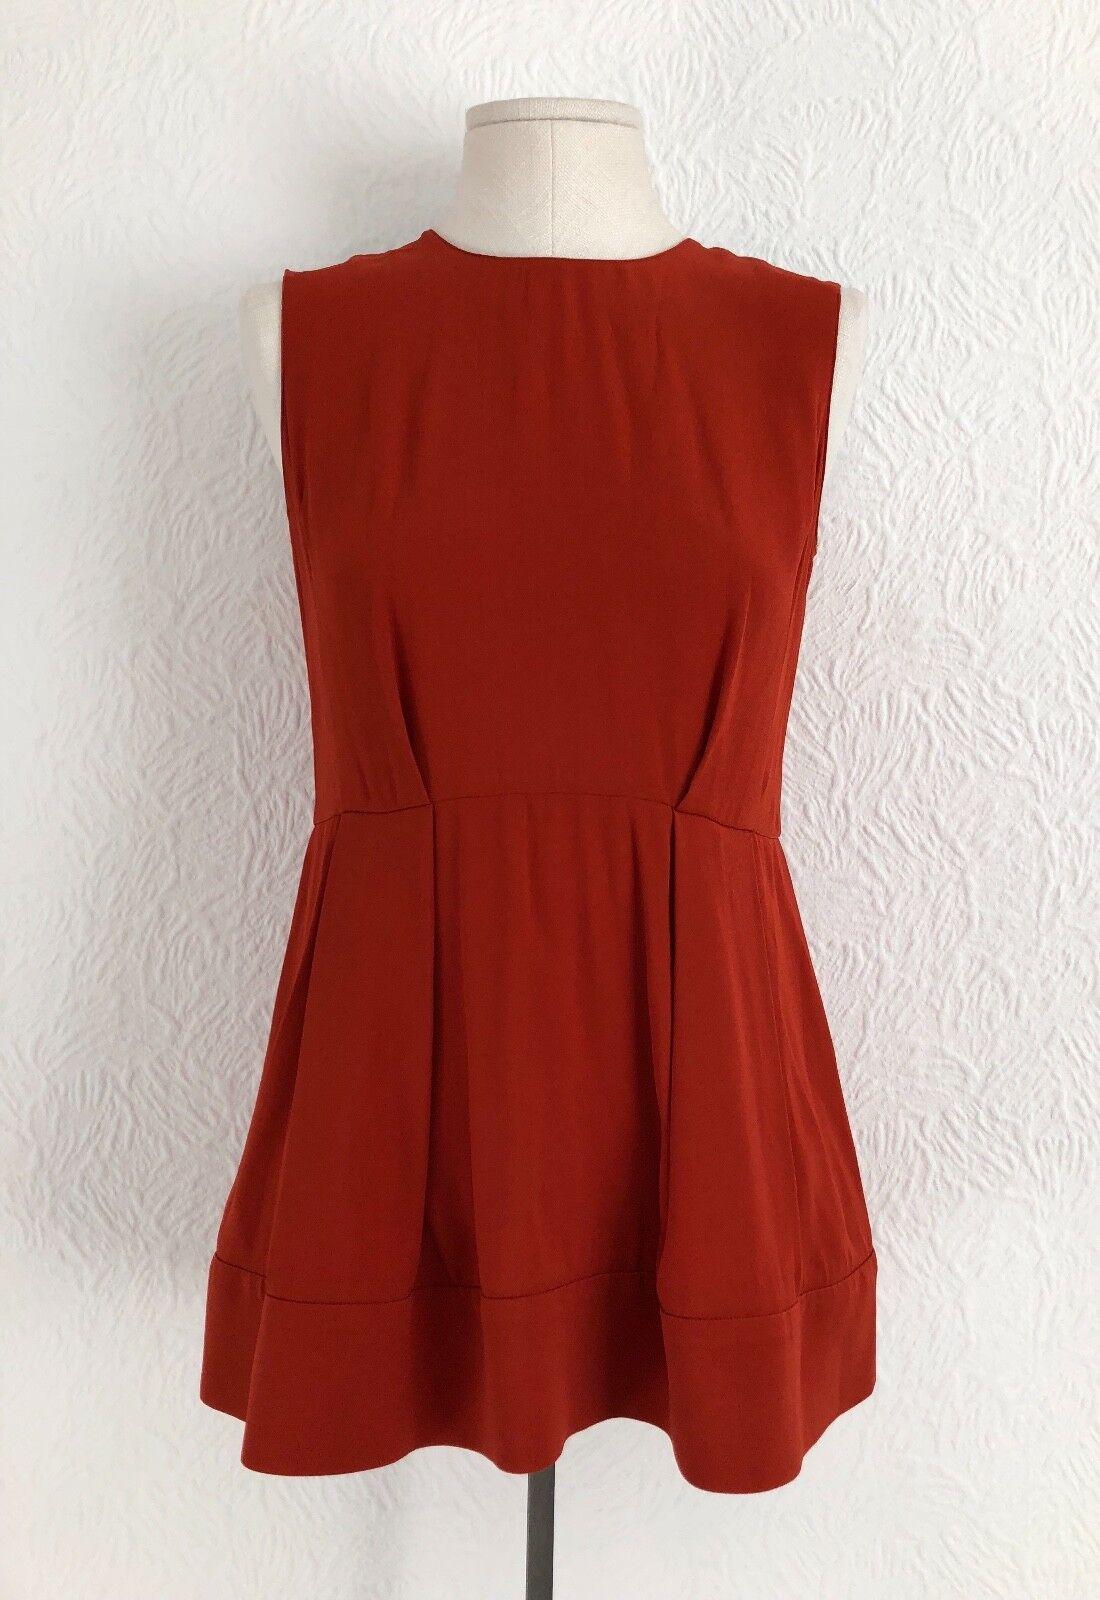 Marni - Orange-Brick Sleeveless Top -